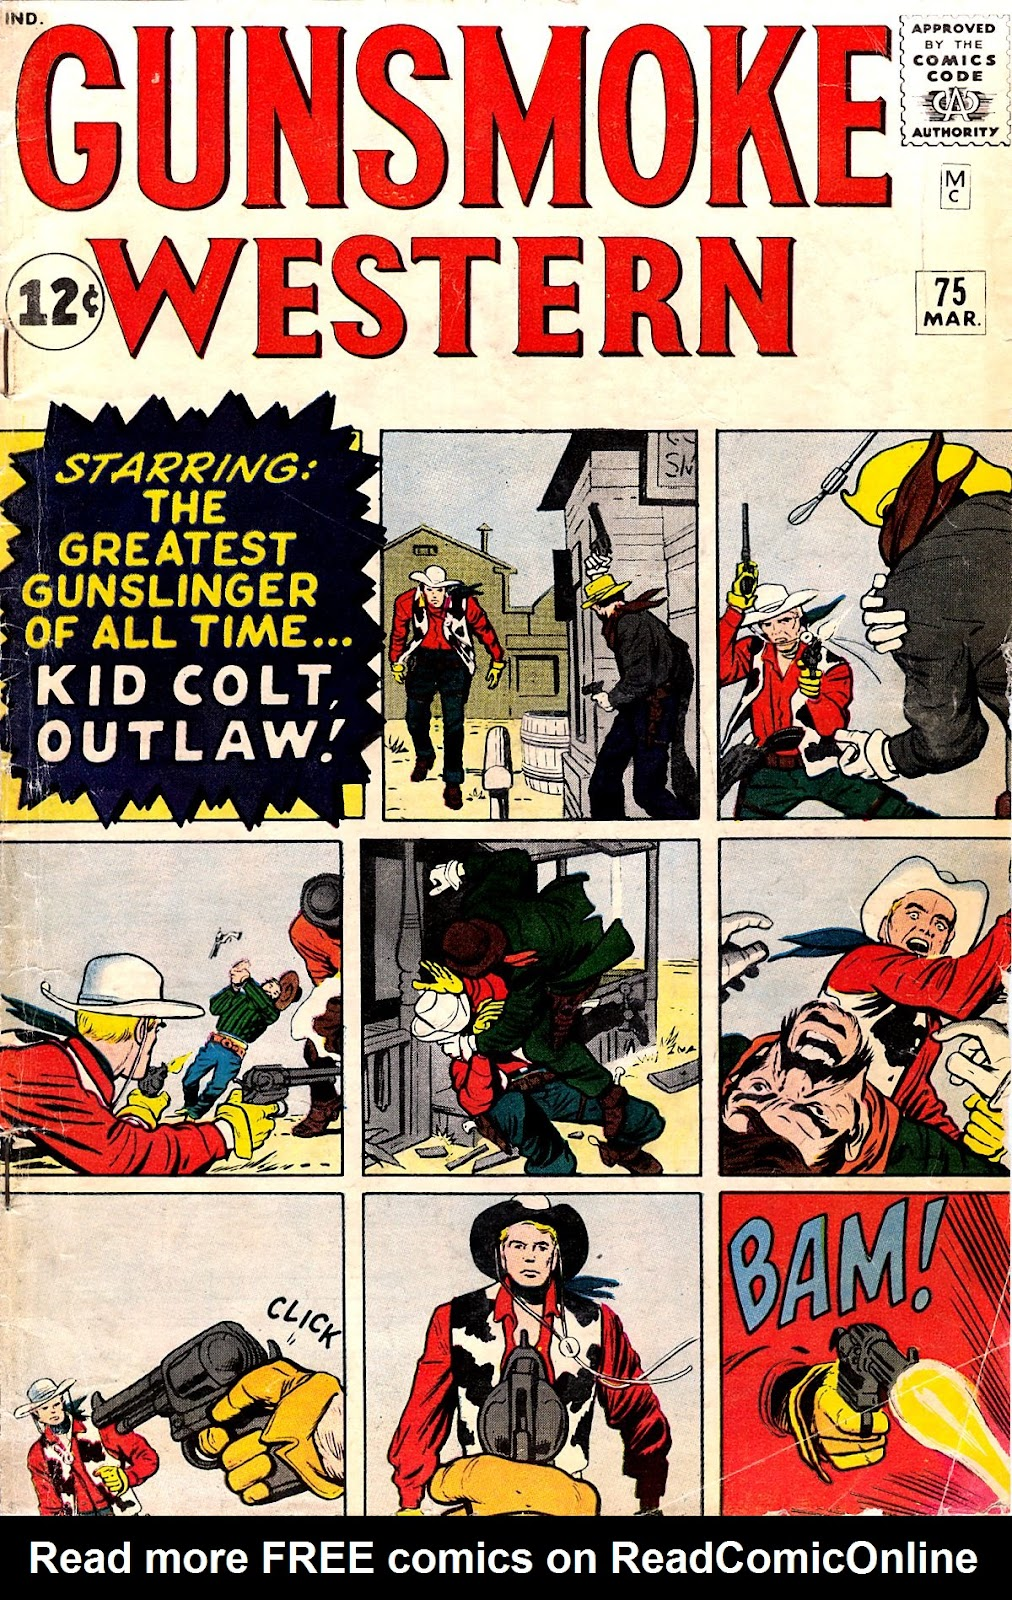 Gunsmoke Western issue 75 - Page 1